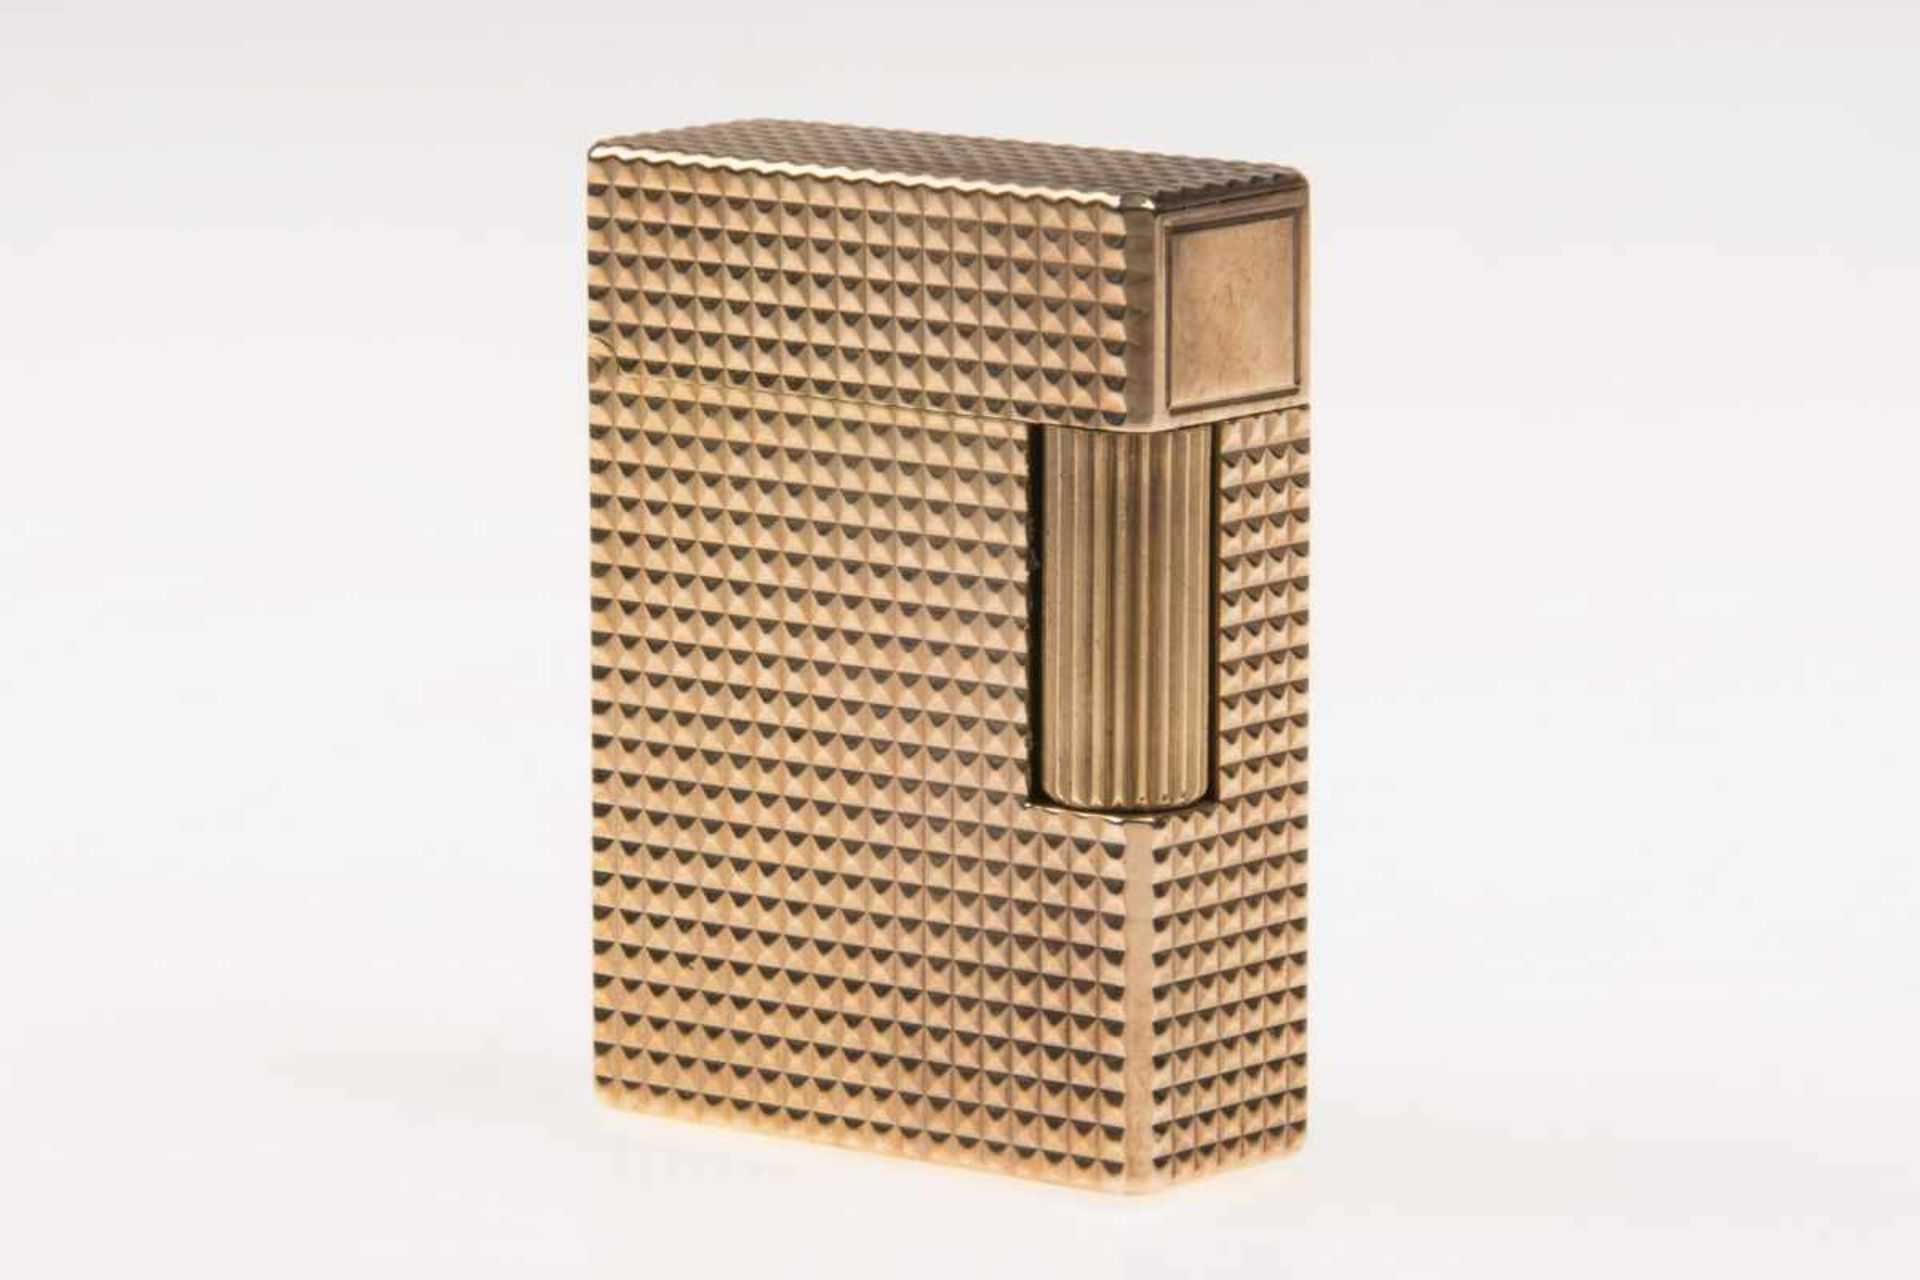 S.T.Dupont Paris Gasmetallfeuerzeug Dupont, vergoldet, in Etui;